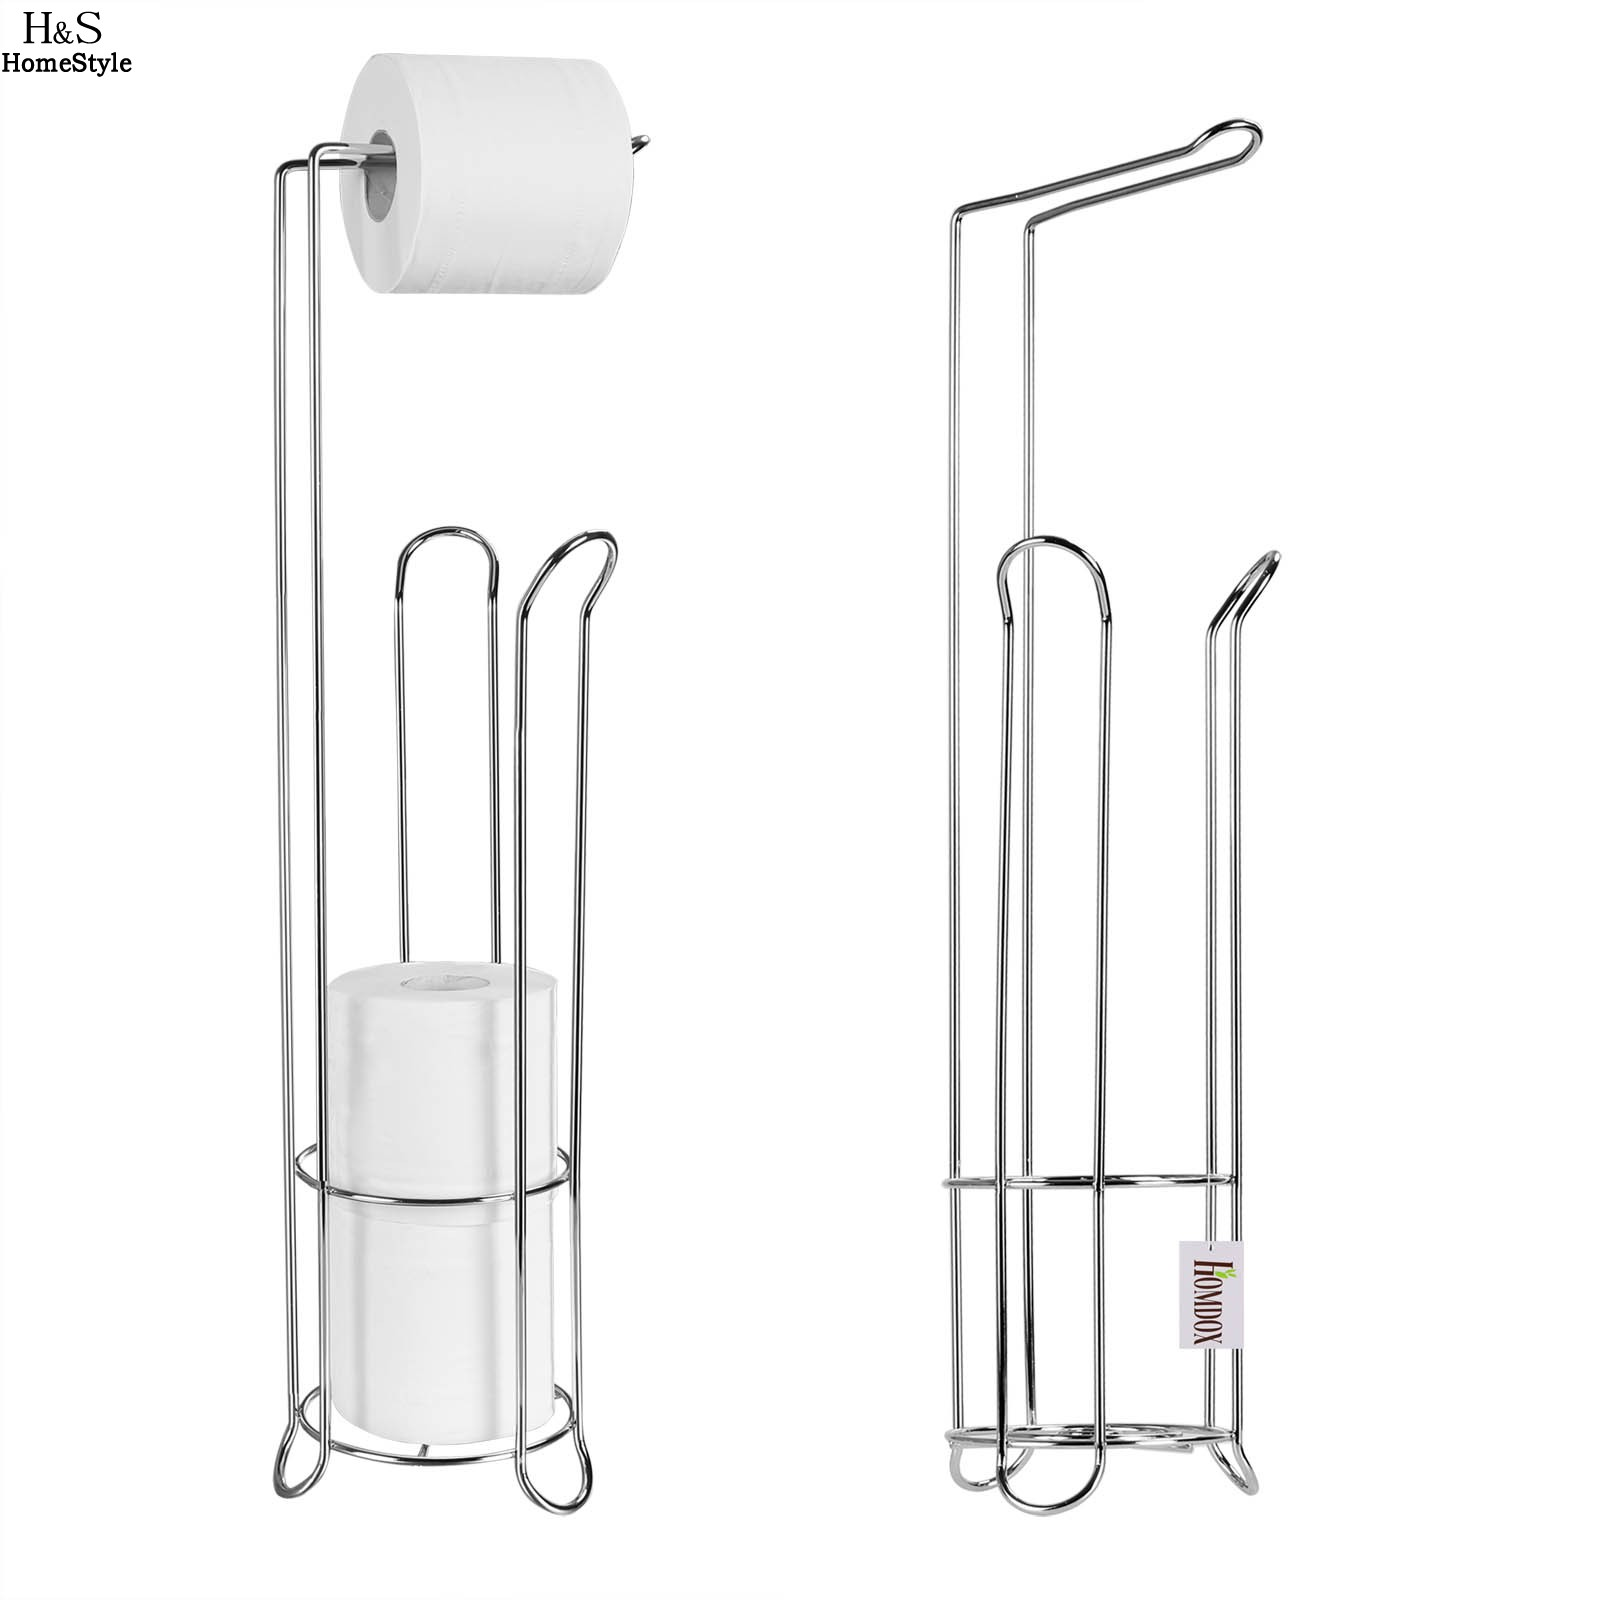 Bathroom and toilet accessories - Homdox New Stainless Steel Toilet Paper Roll Stand Holder Bathroom Storage Rack Tissue Organizer Toilet Accessories